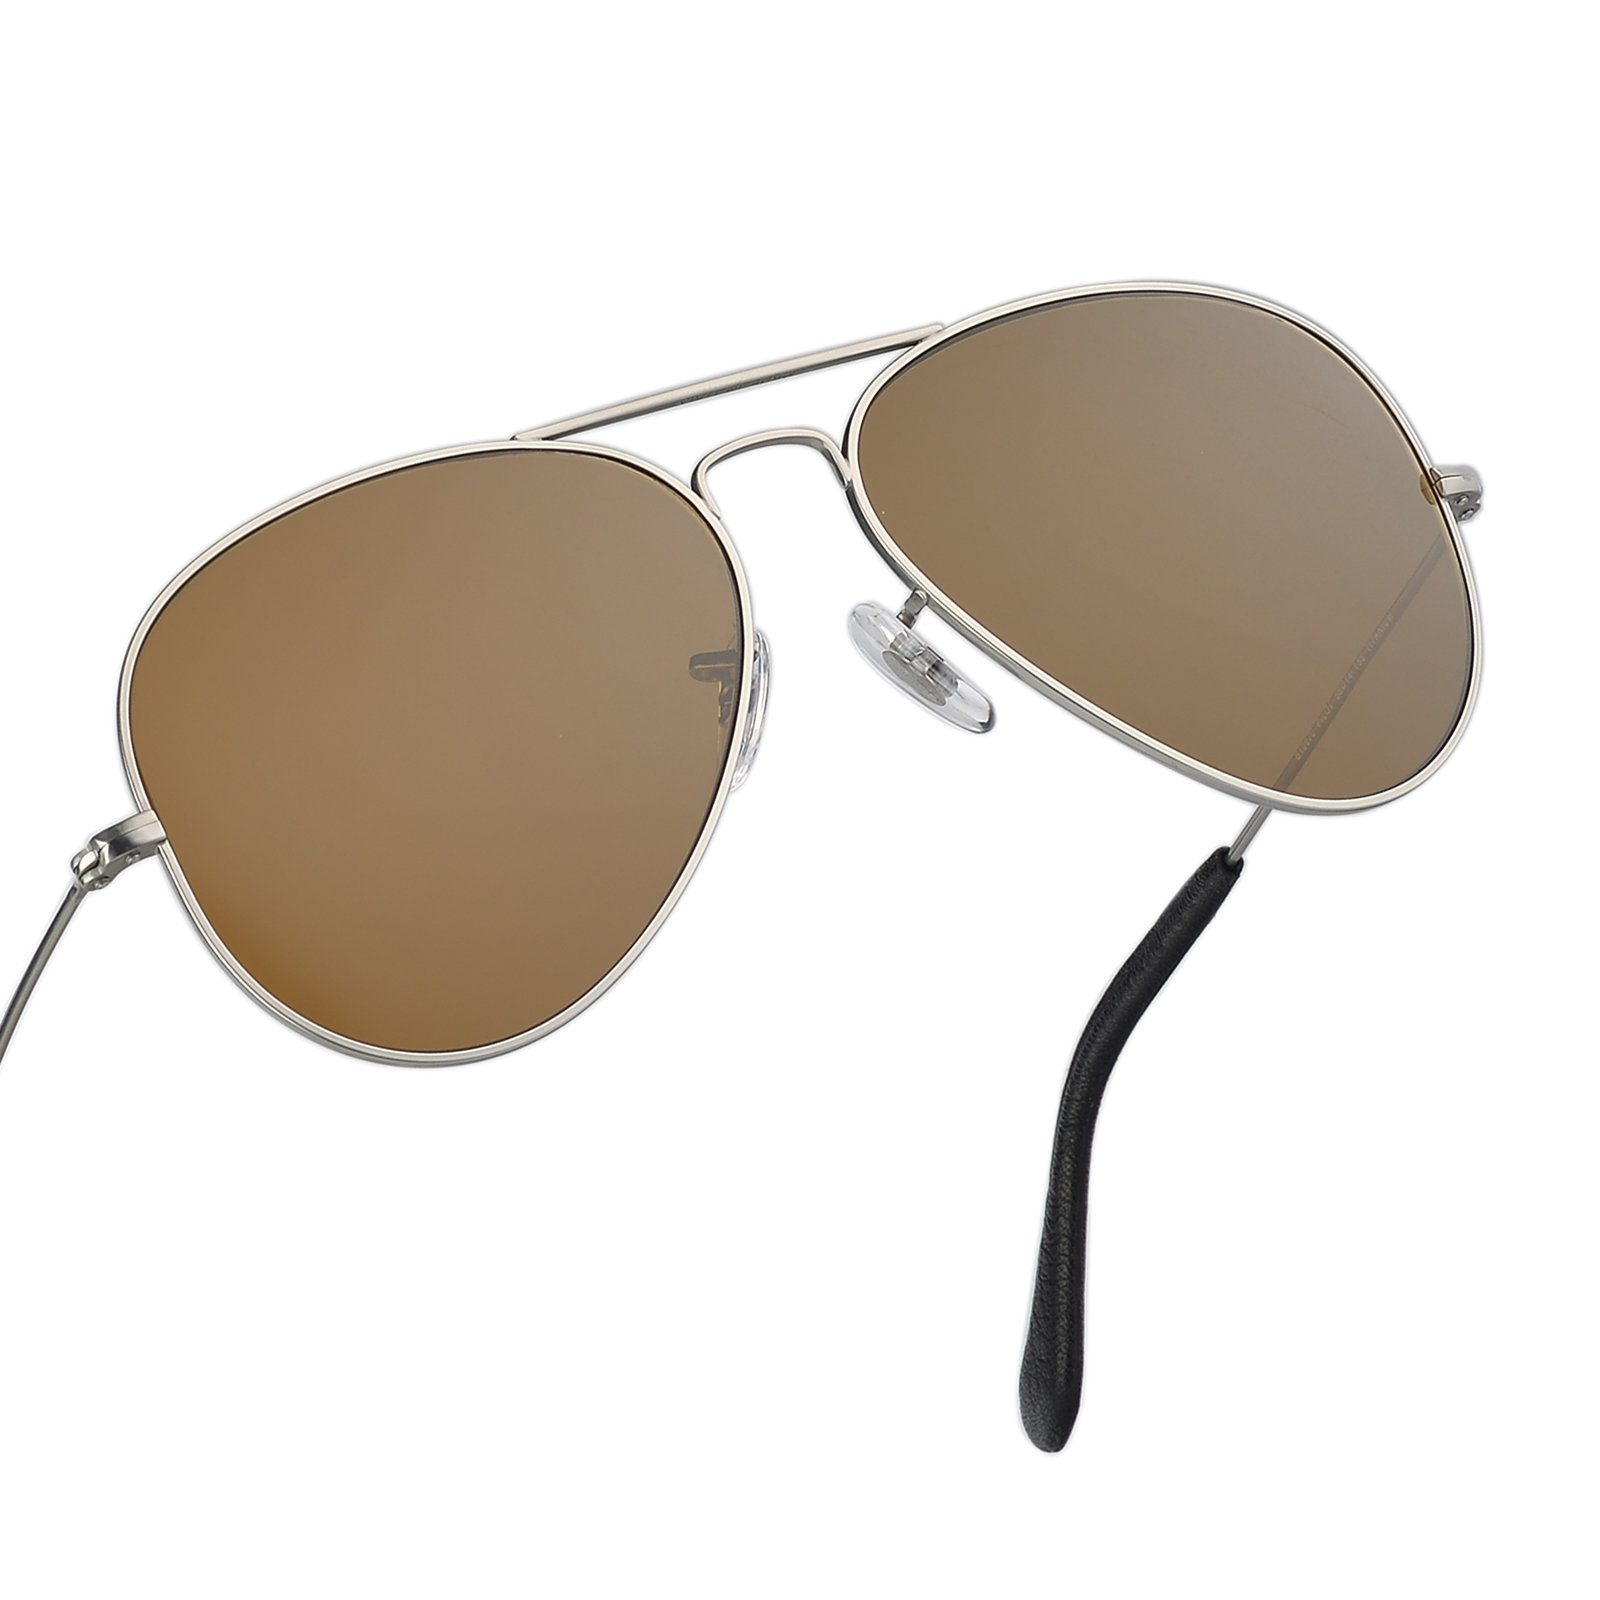 Italy made pilot titanium sunglasses w. corning natural glass truecolor polarized (Brown, Silver Titanium)